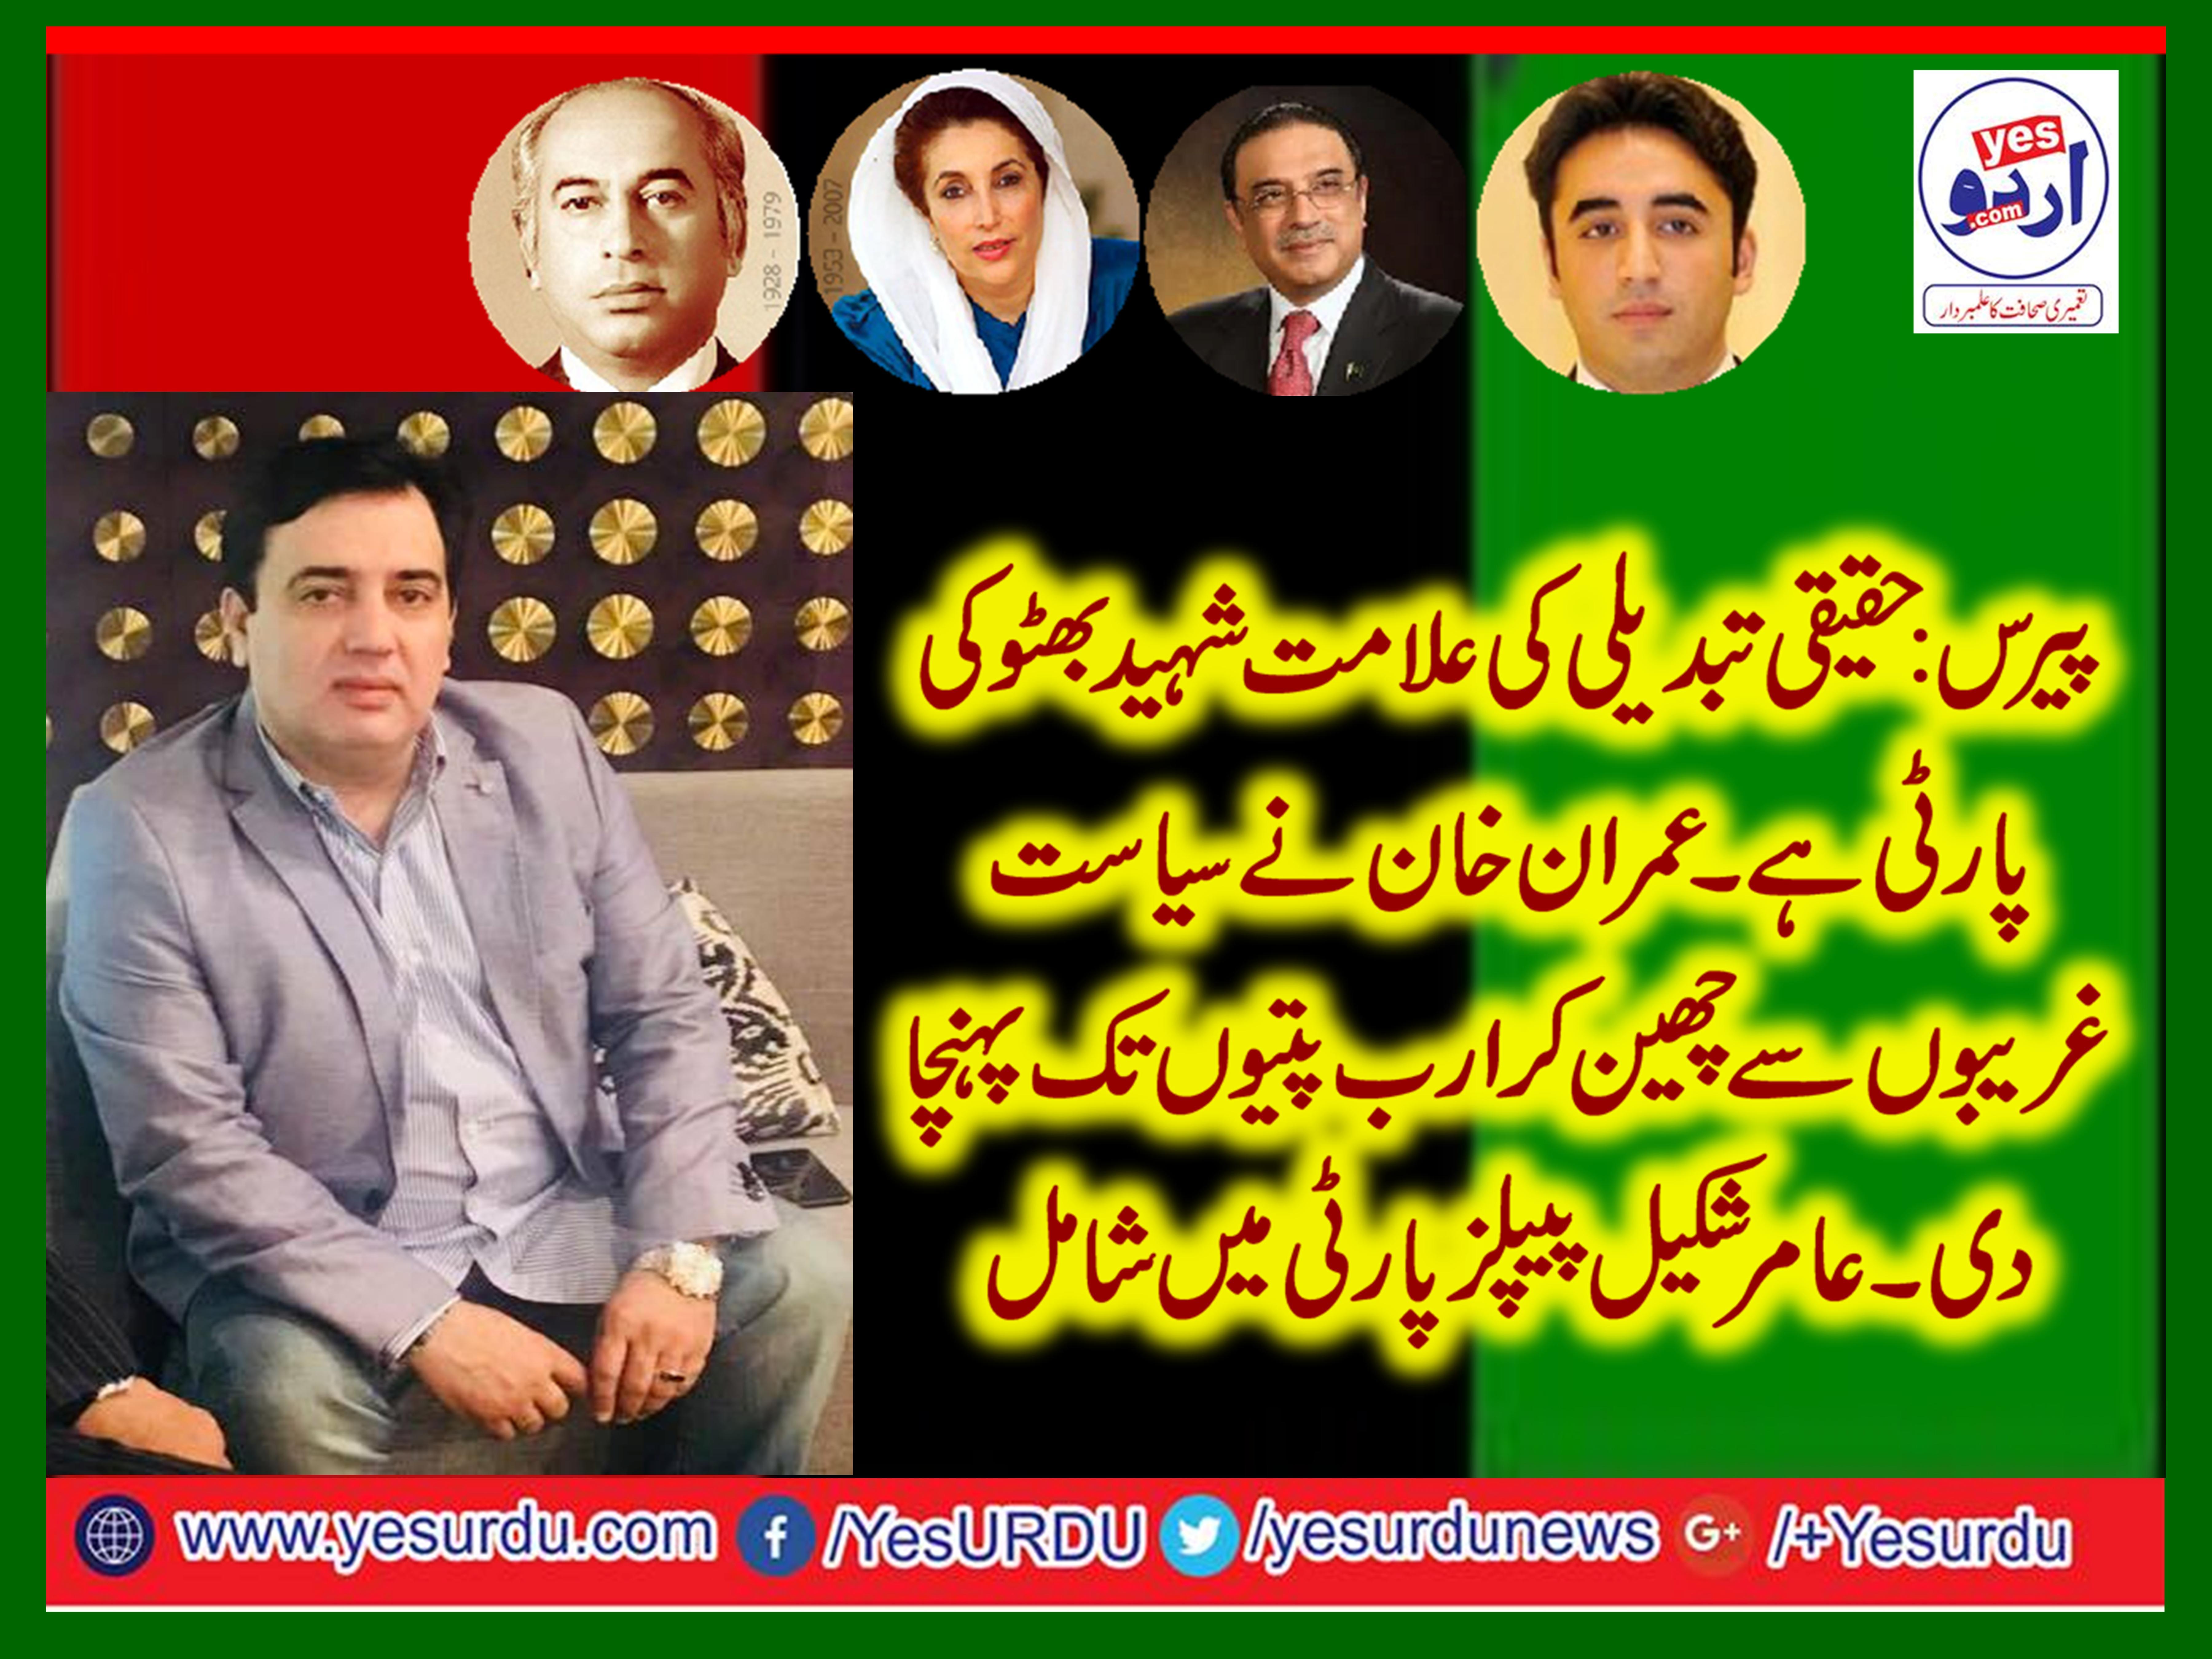 haji amir shakeel, joined, PPP, qari farooq ahmed, farooqi, and, ch muhammad razaq dhal, welcommed,him,in, the, party